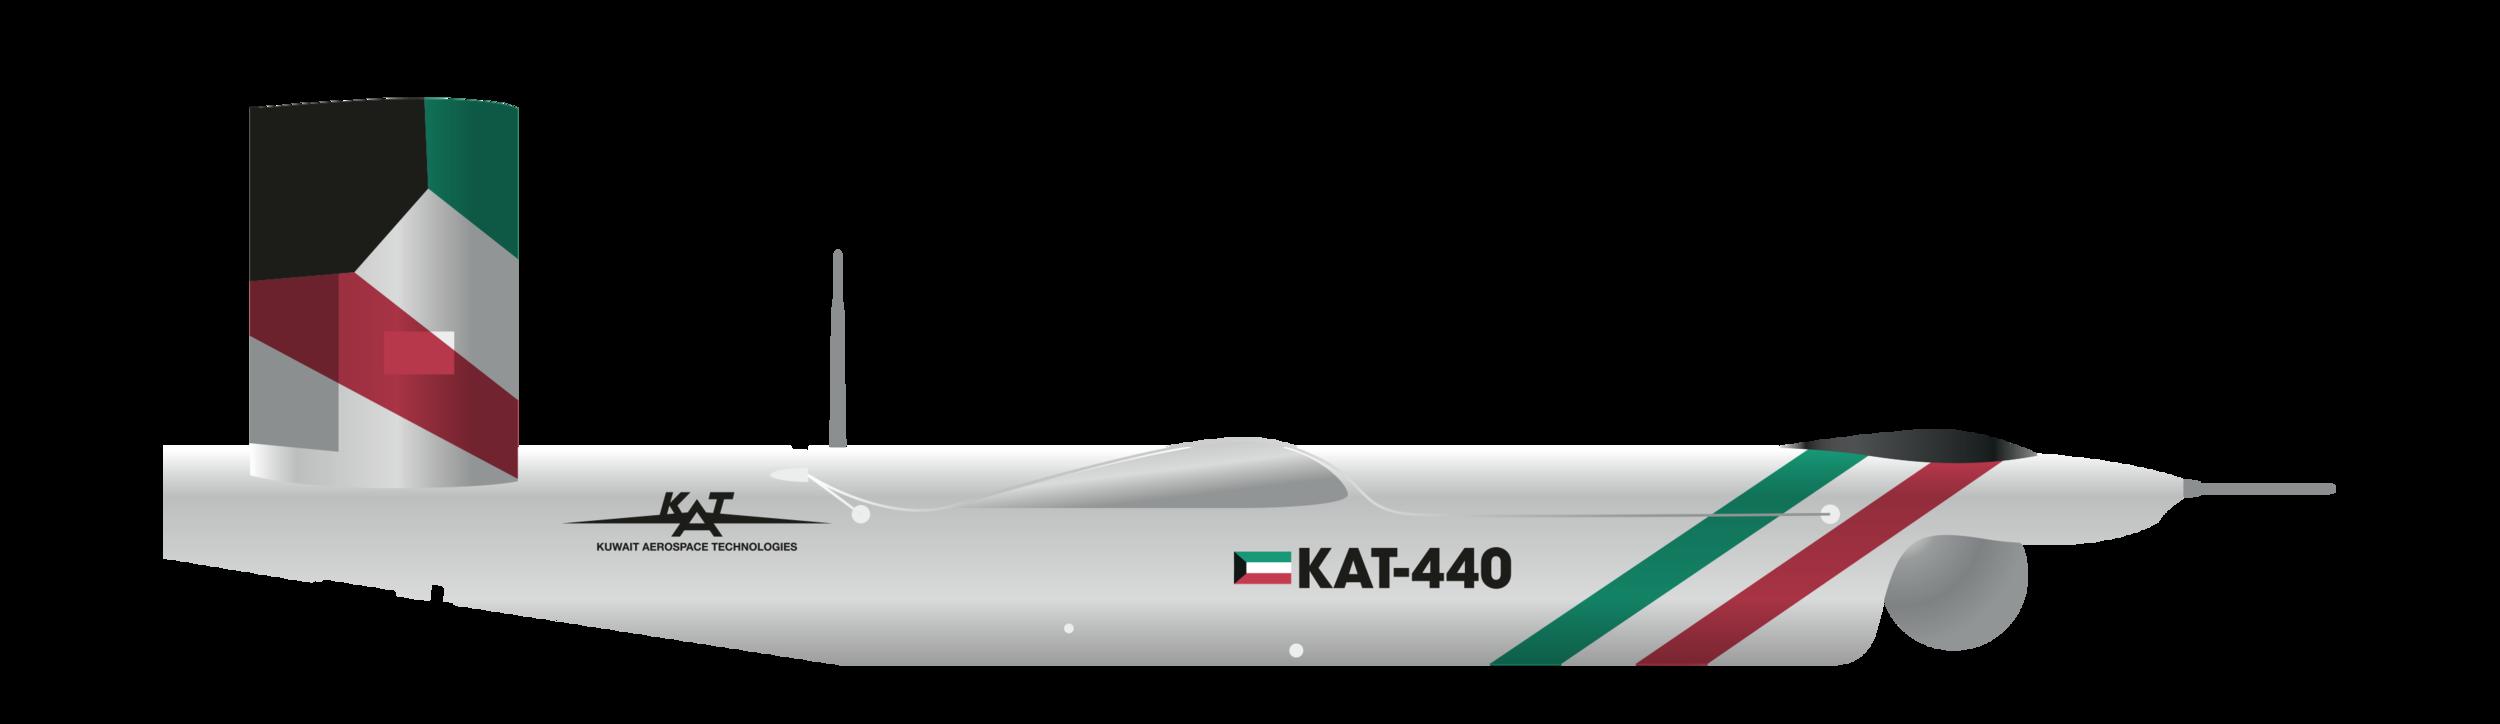 KAT_440_Graphic_Design_2019-2.png